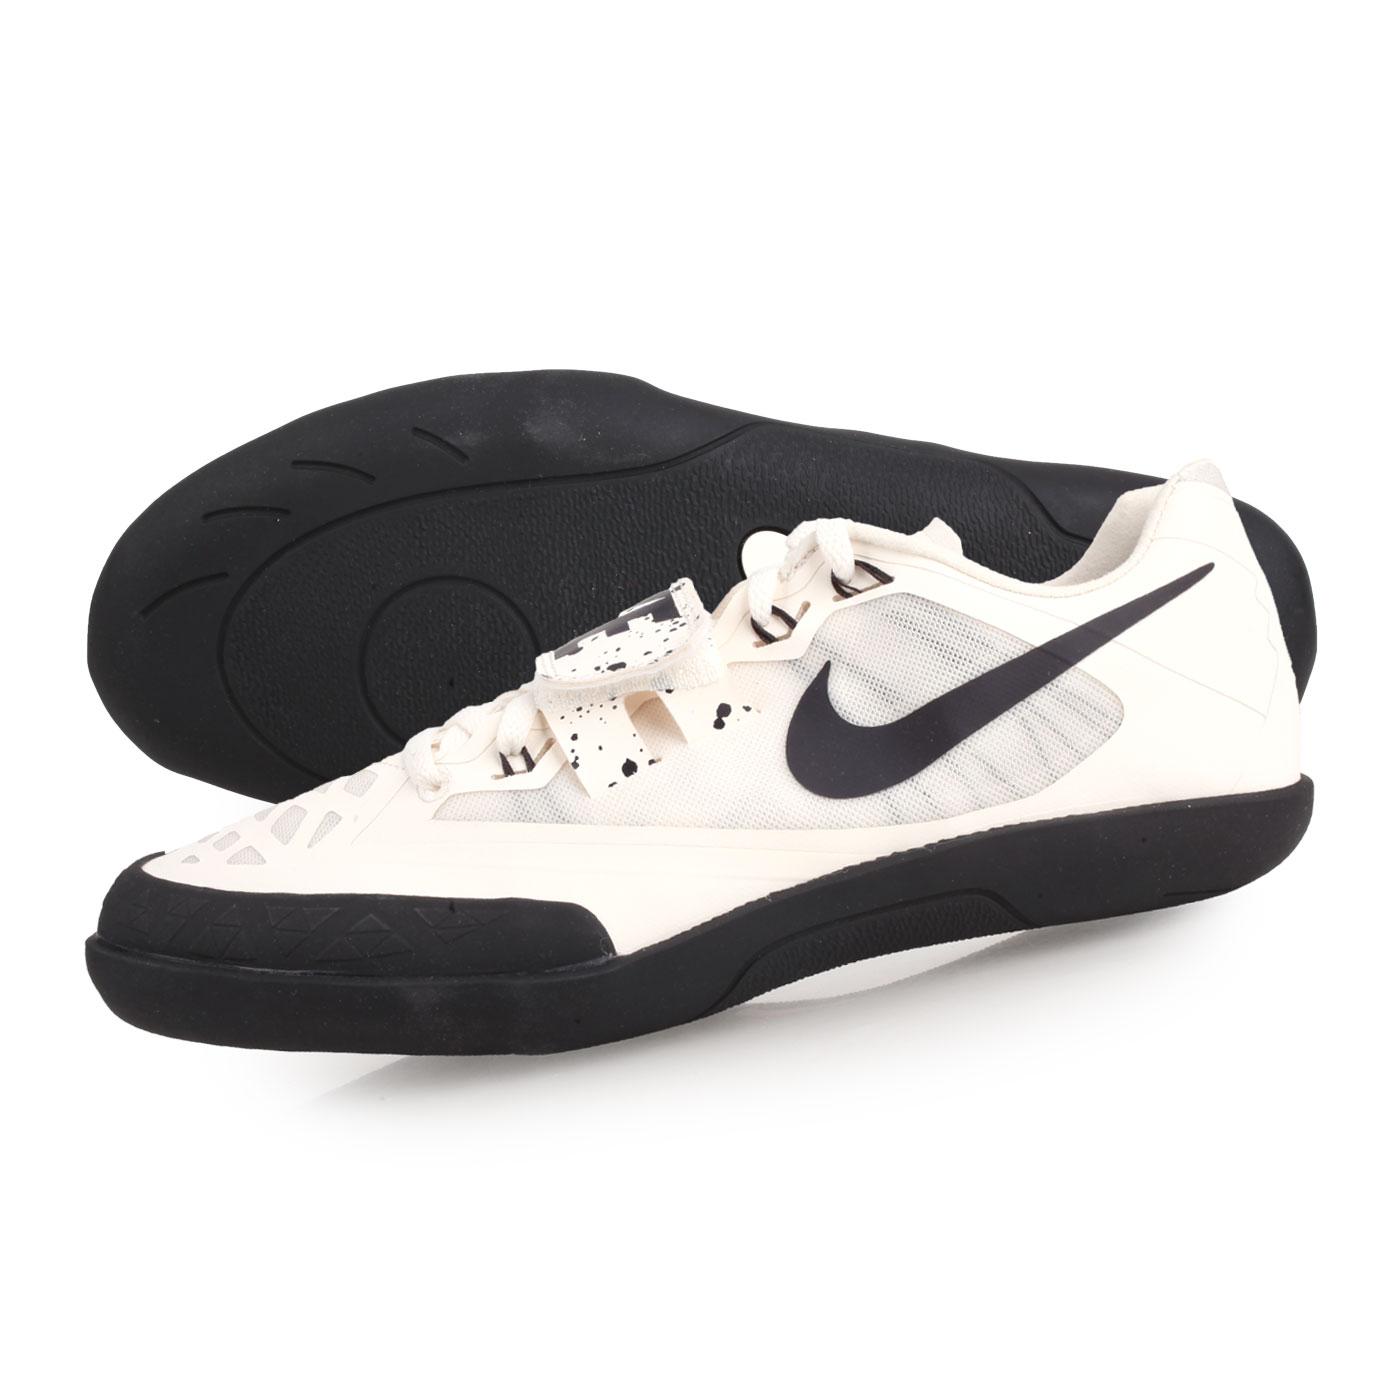 NIKE 擲部鞋  @ZOOM SD 4@685135002 - 米白黑